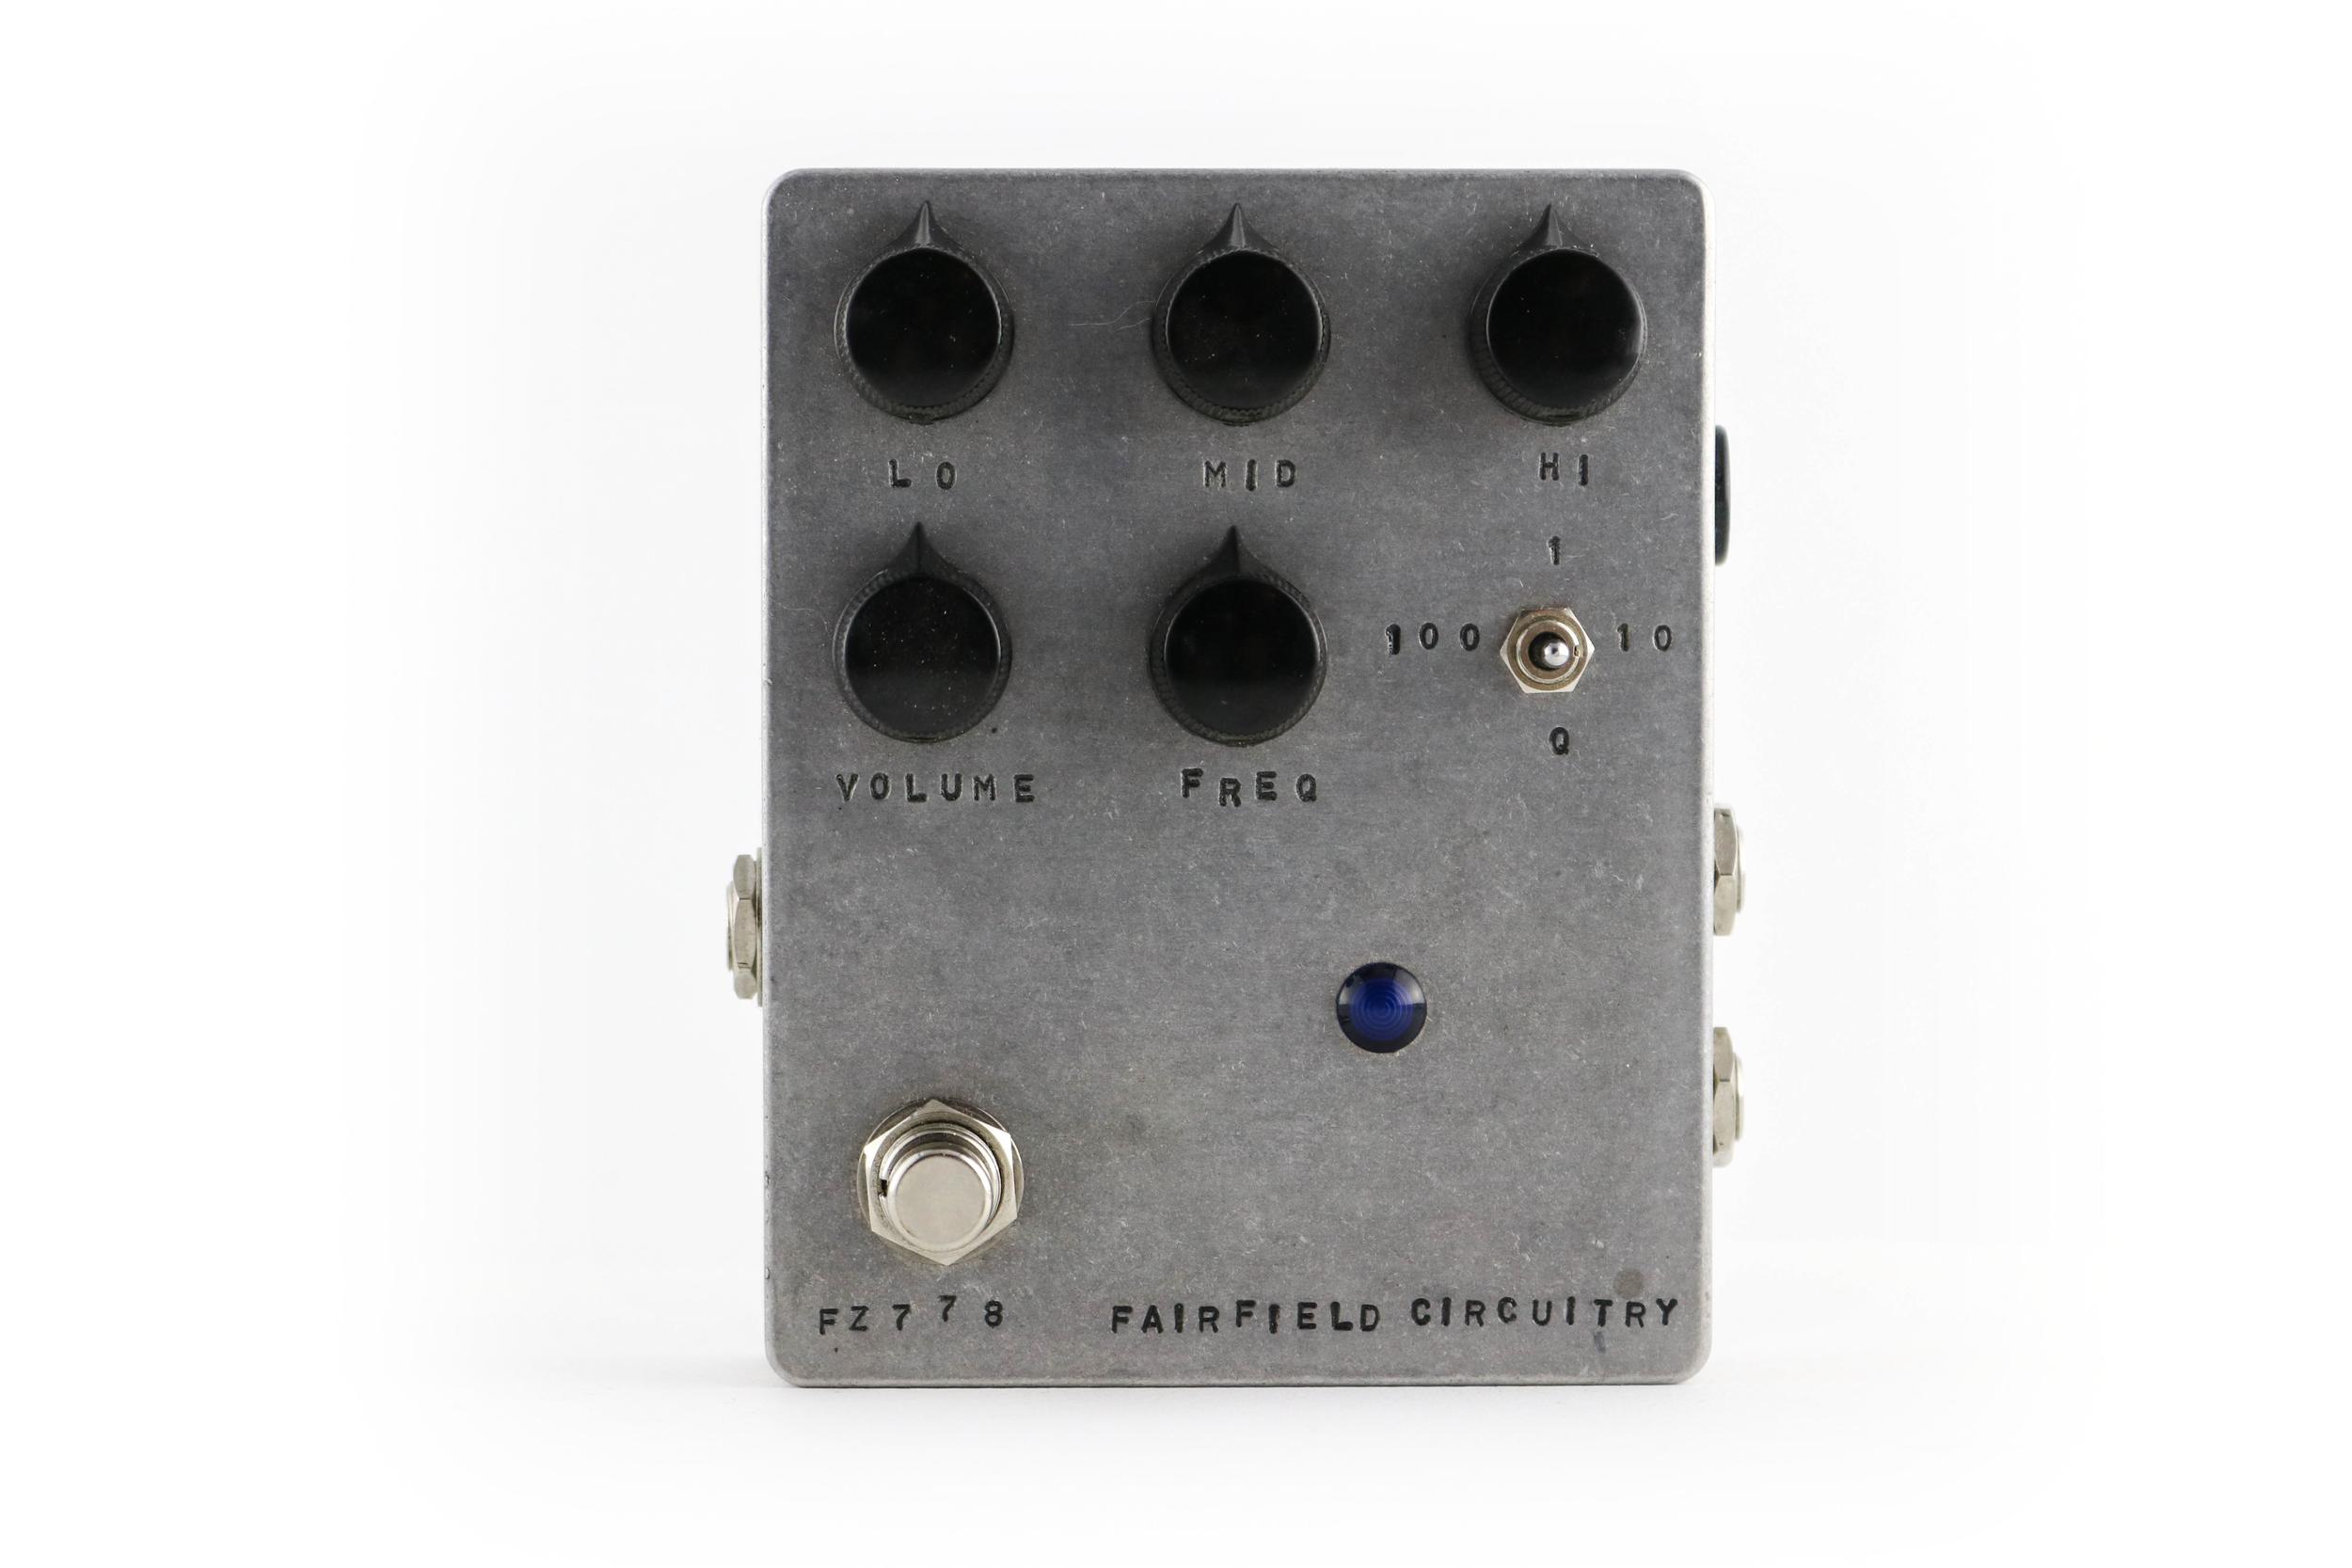 Fairfield-Circuitry-Four-Eye-Fuzz.png